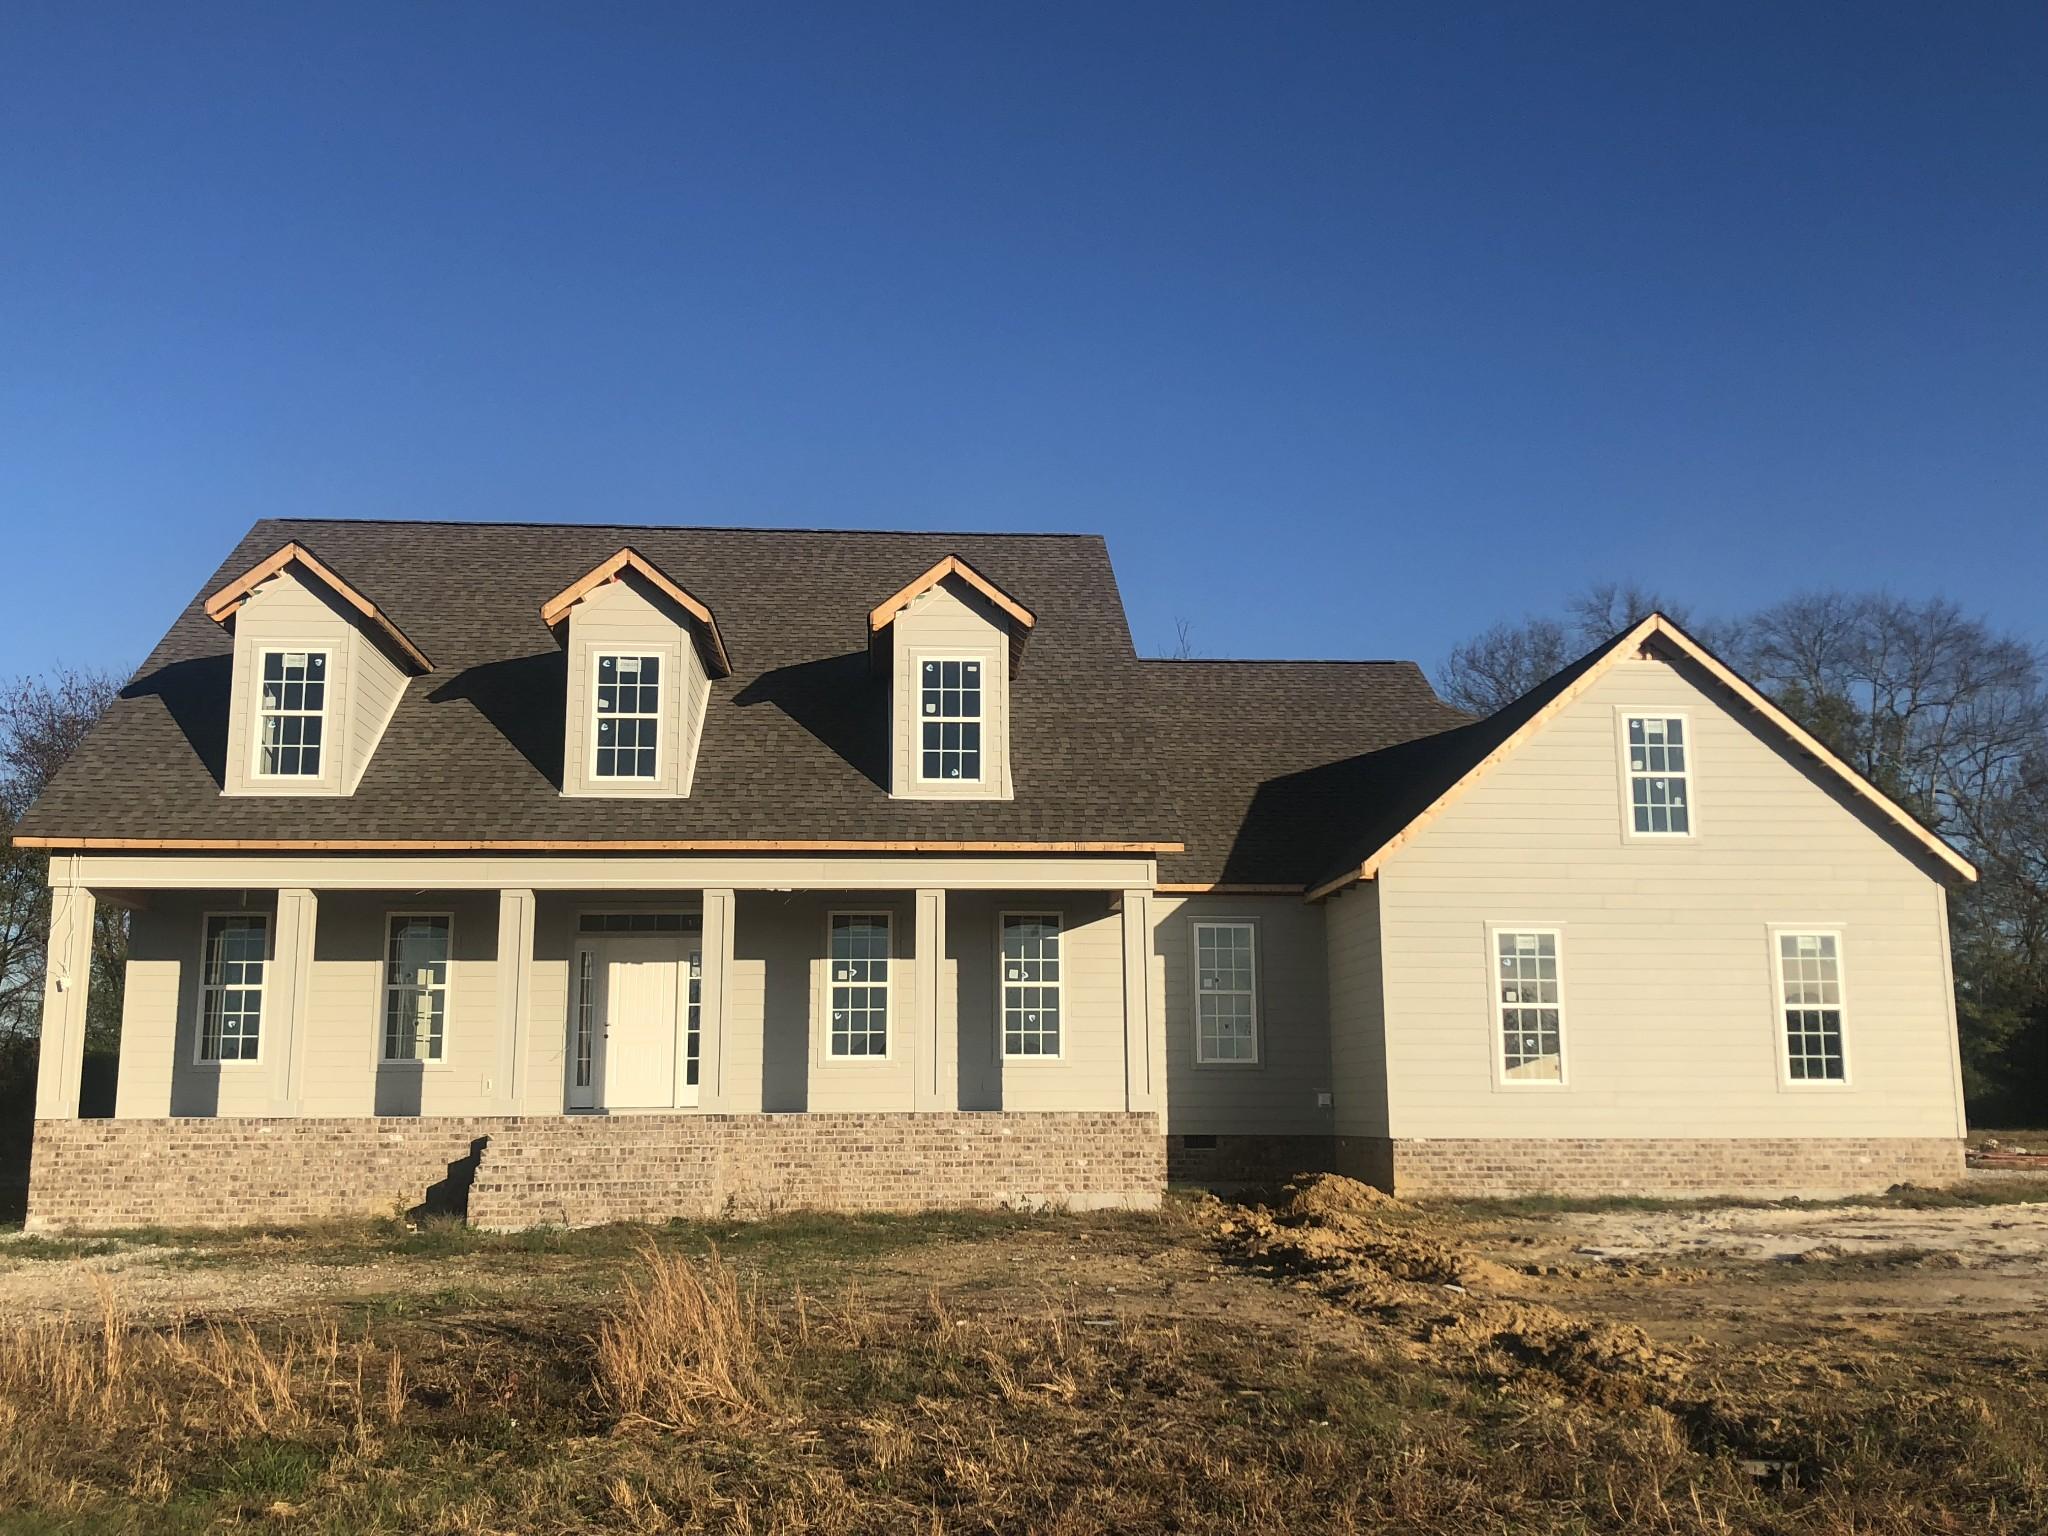 225 Aberdeen Ave, Hillsboro, TN 37342 - Hillsboro, TN real estate listing